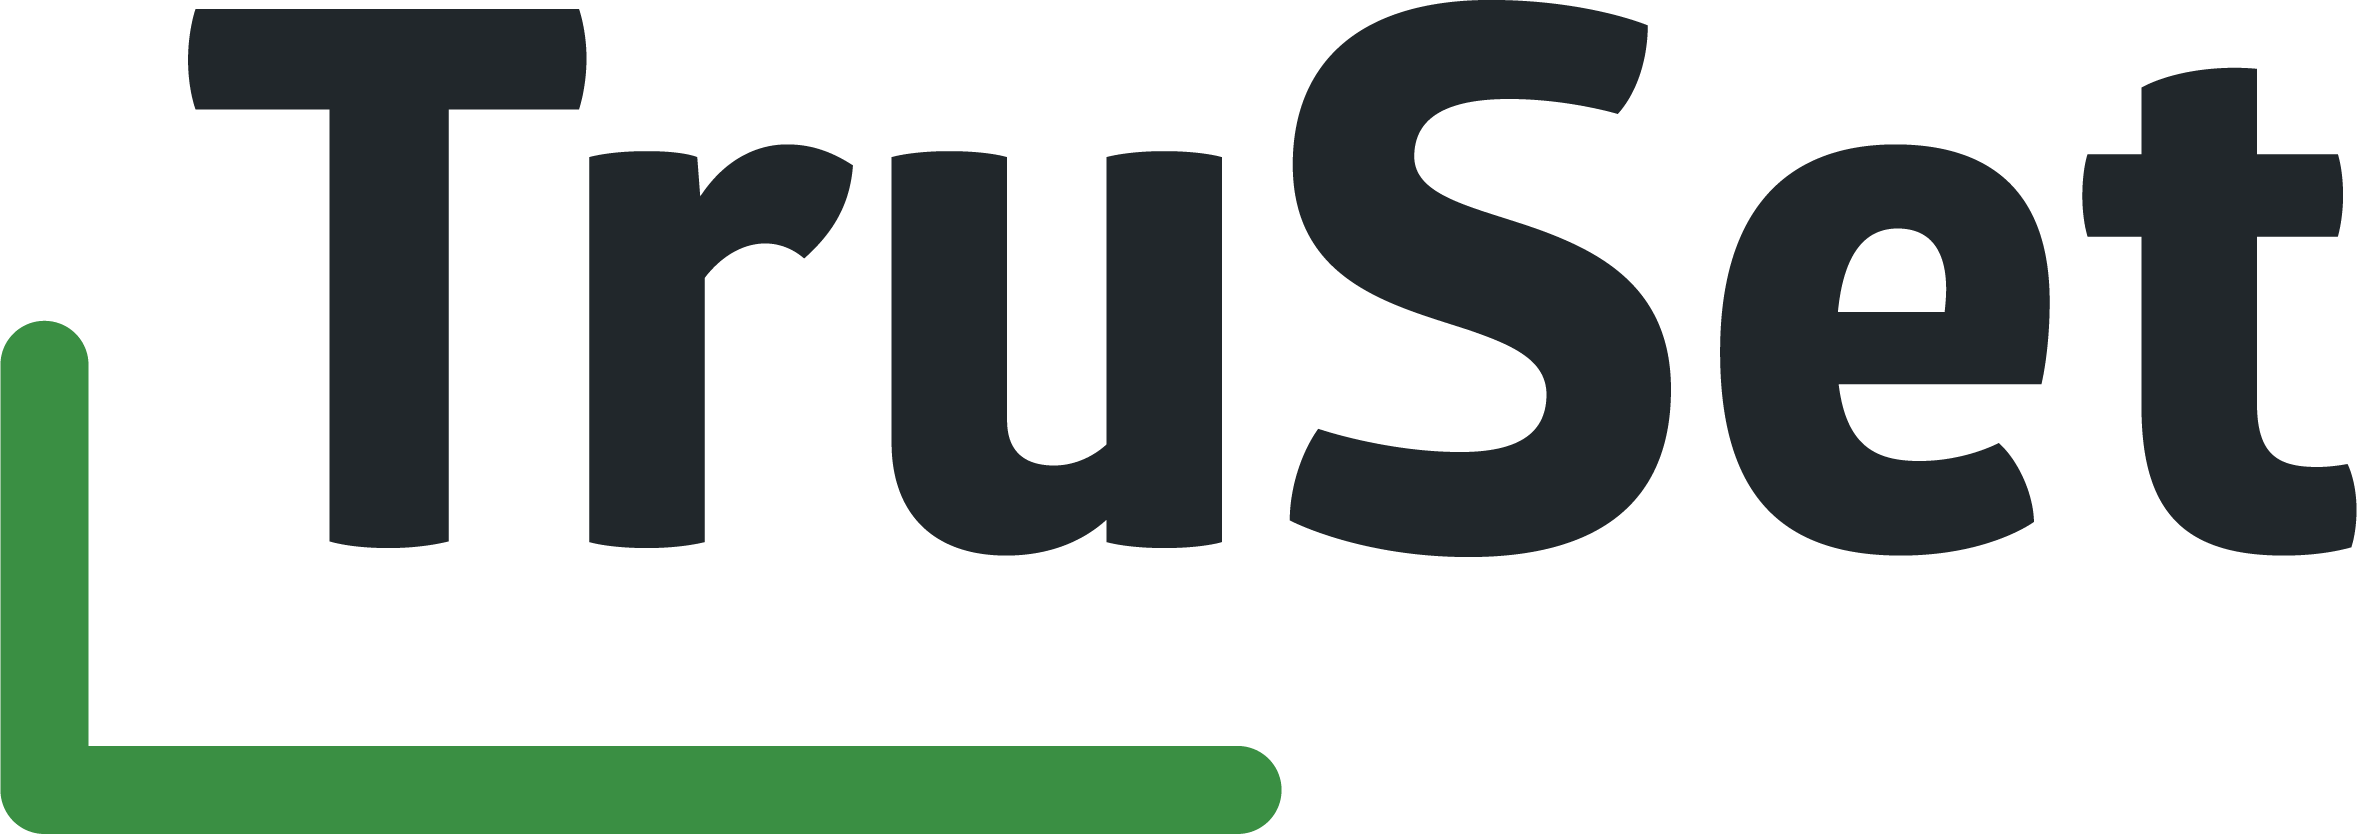 trueset_logotype.png